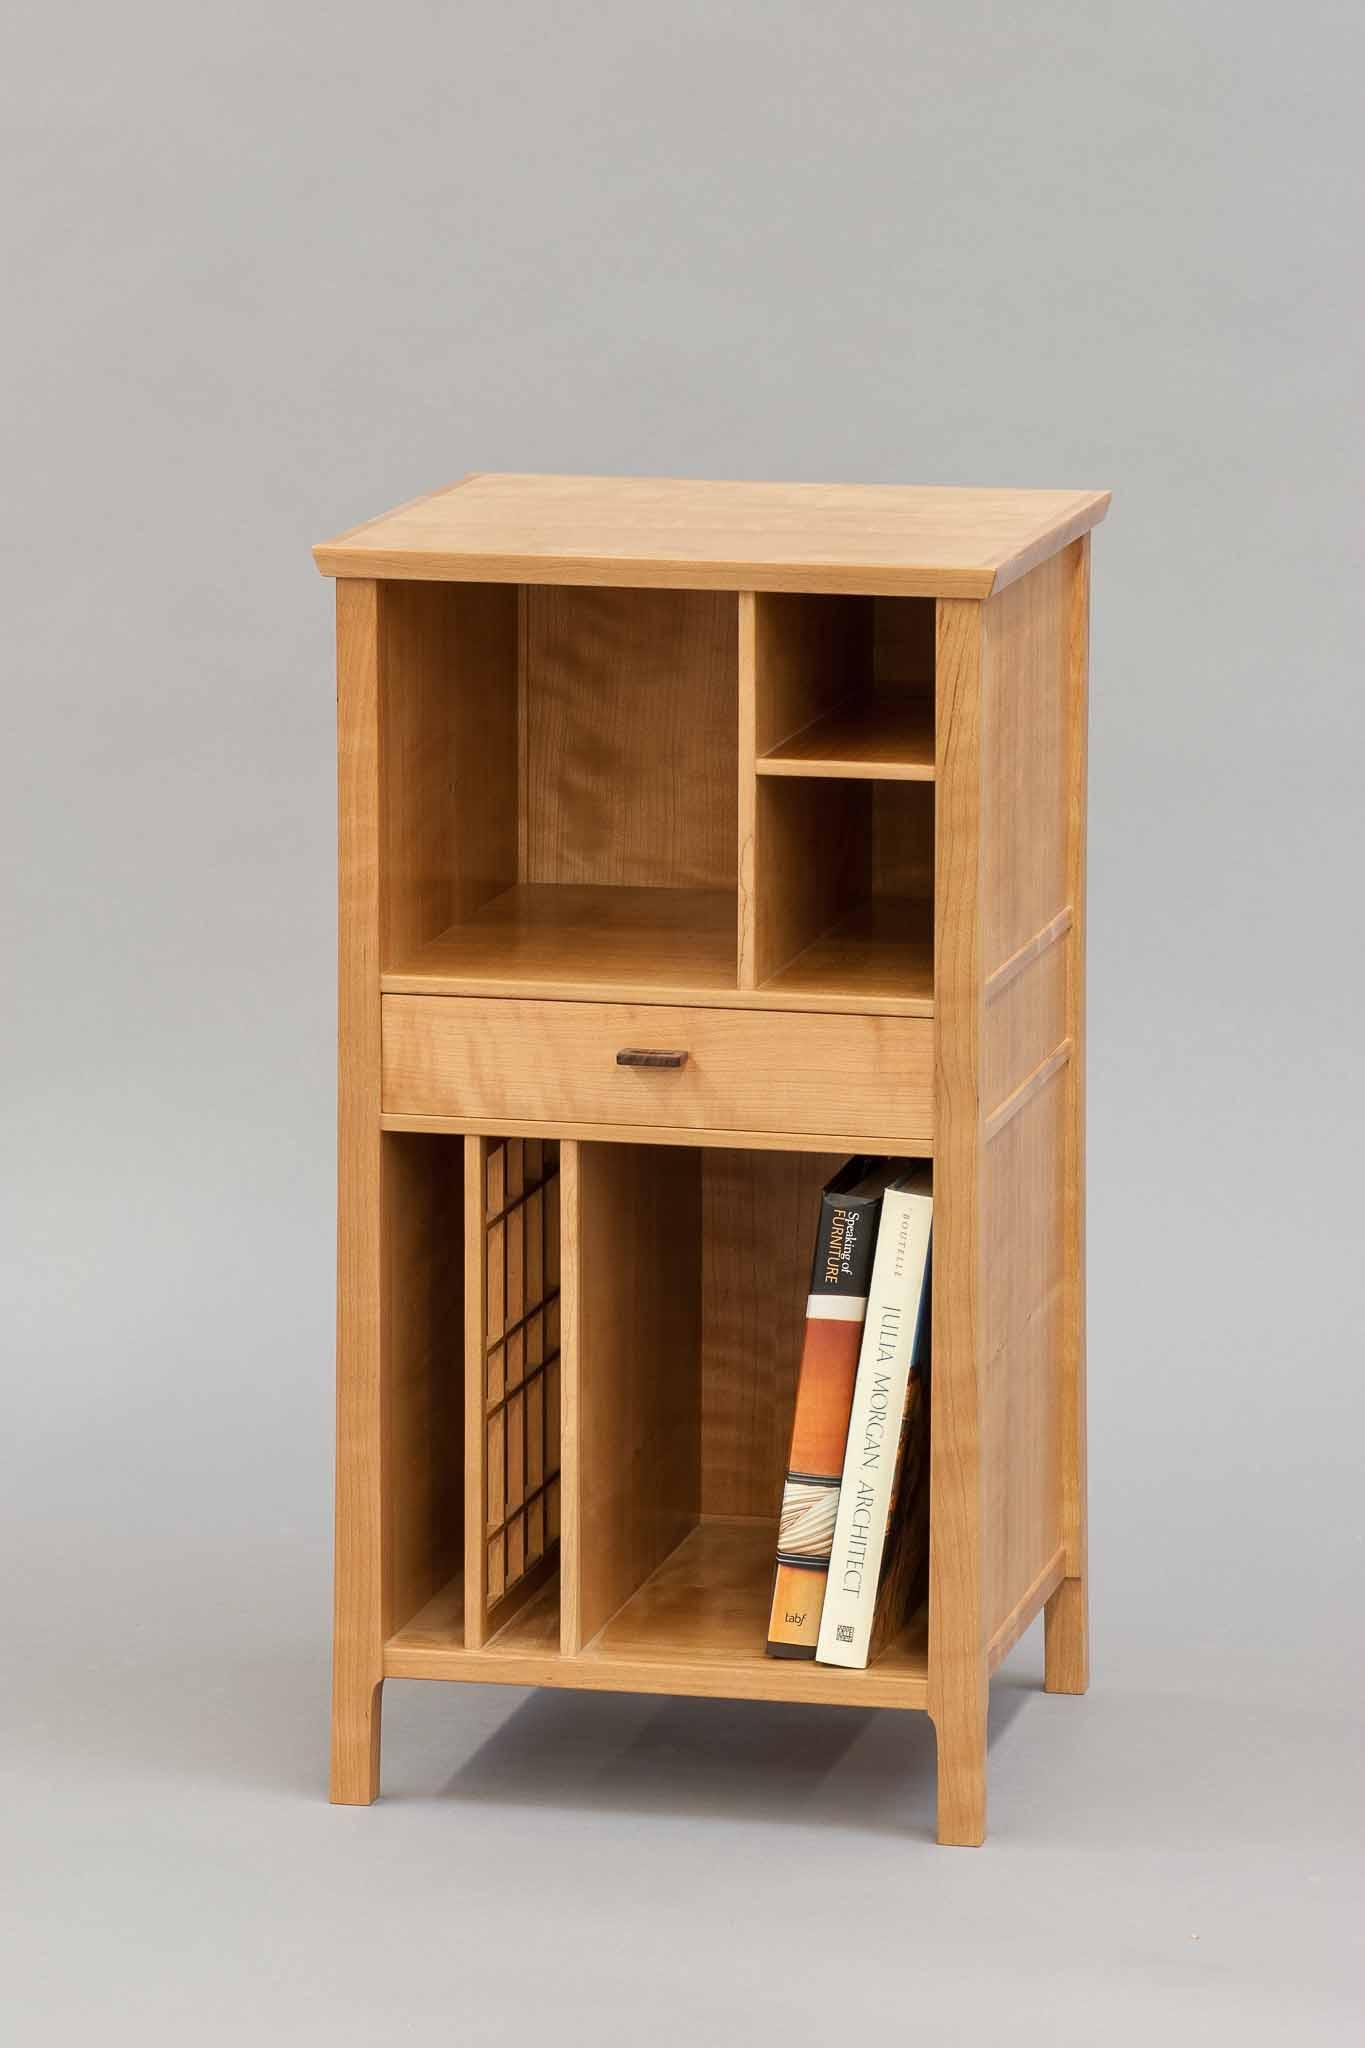 meet b4192 b6fde Bedside Bookcase « The Krenov School of Fine Furniture